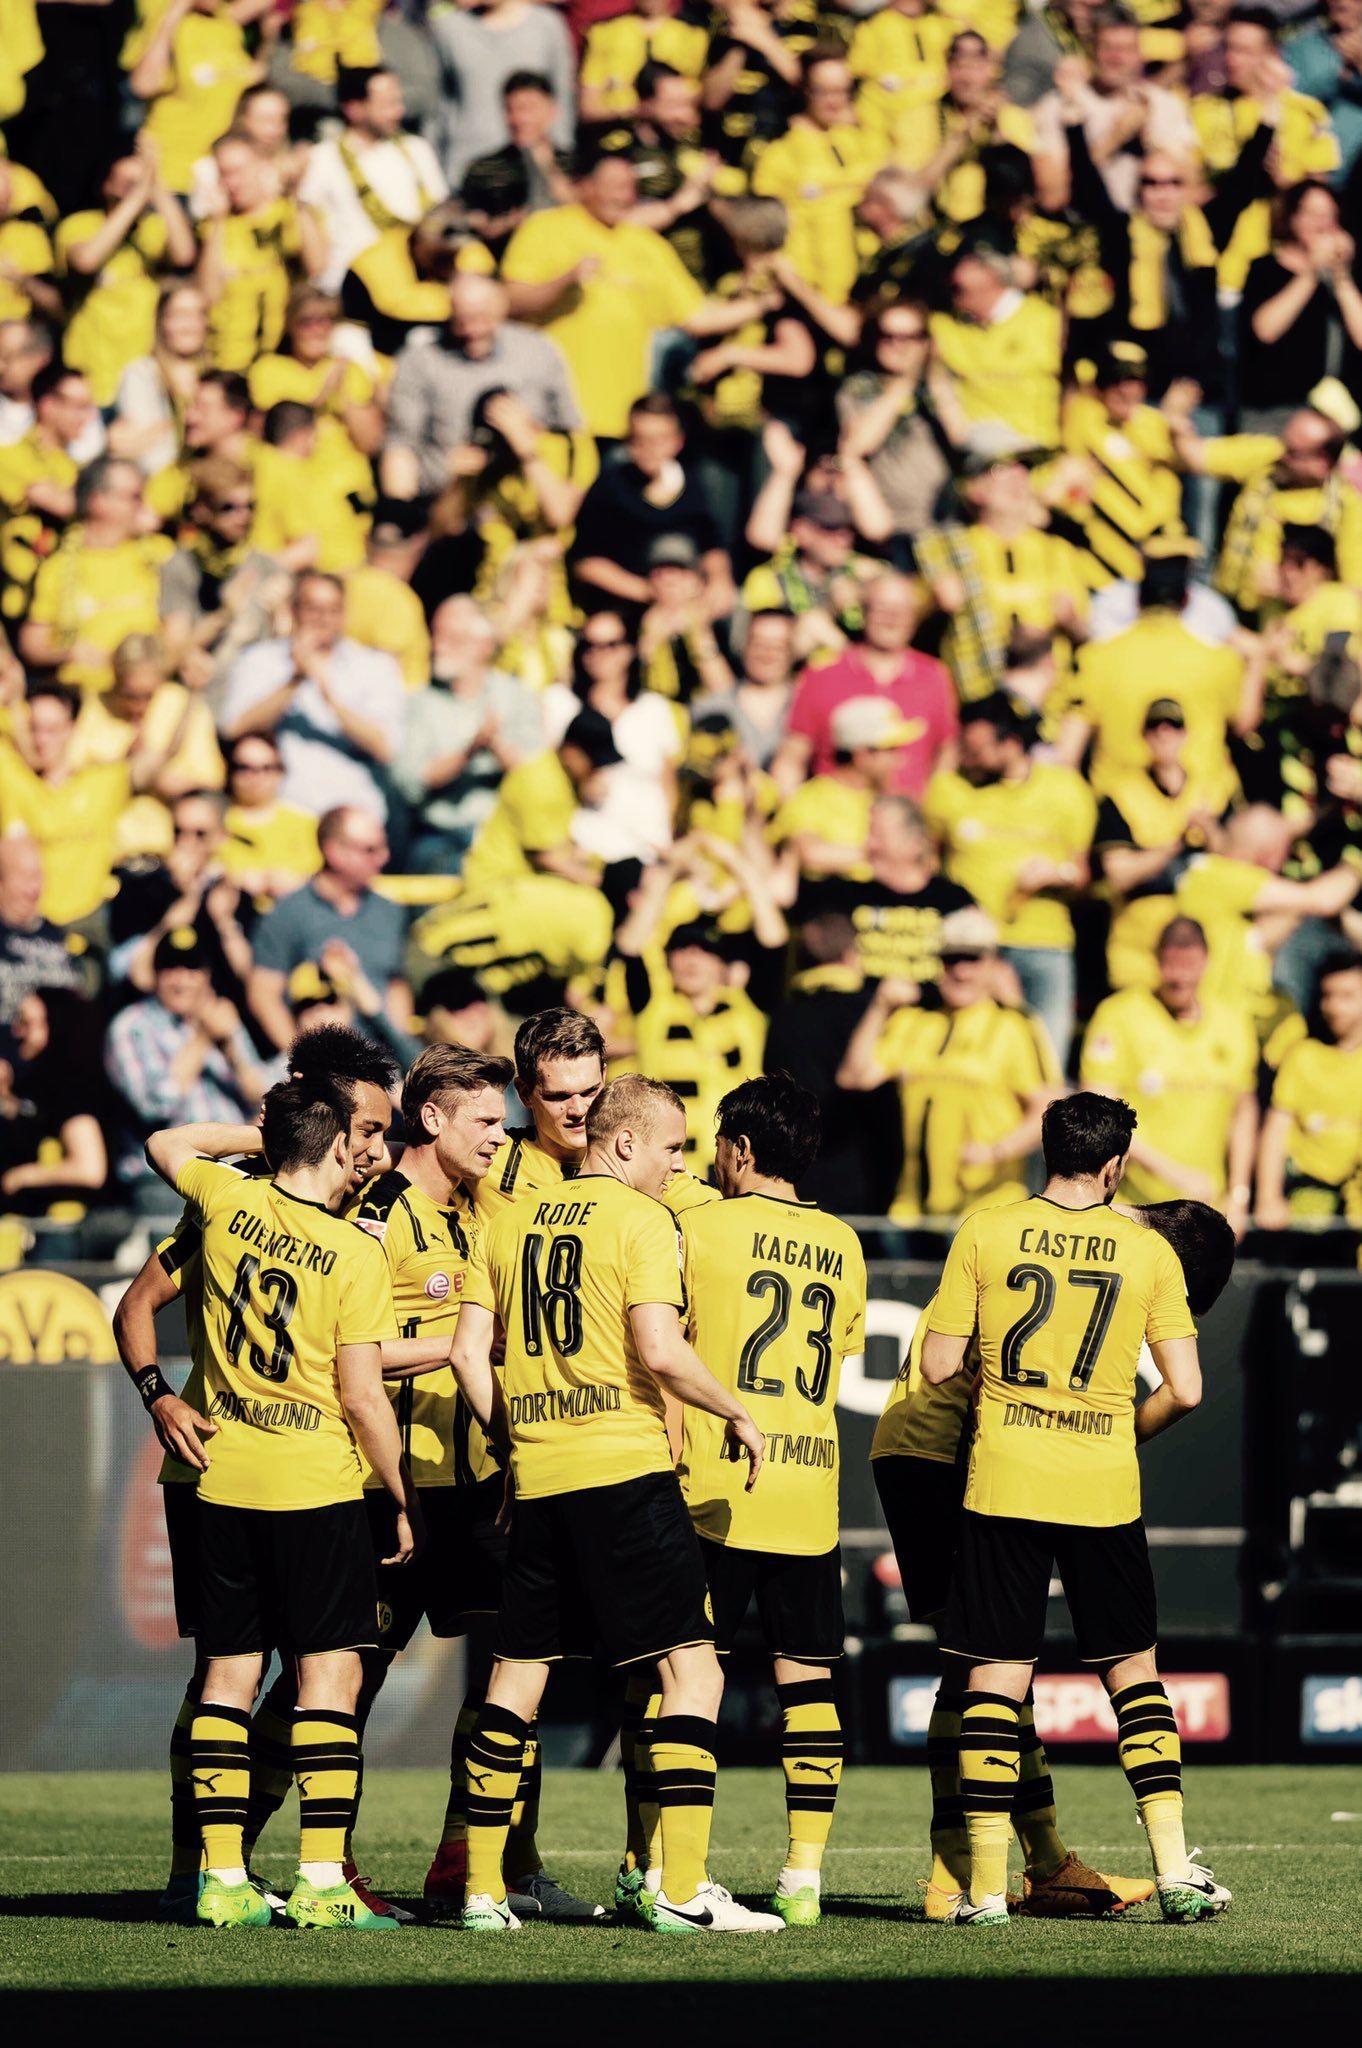 Borussia Dortmund おしゃれまとめの人気アイデア Pinterest Bil Koko ドルトムント サッカーの壁紙 サッカー